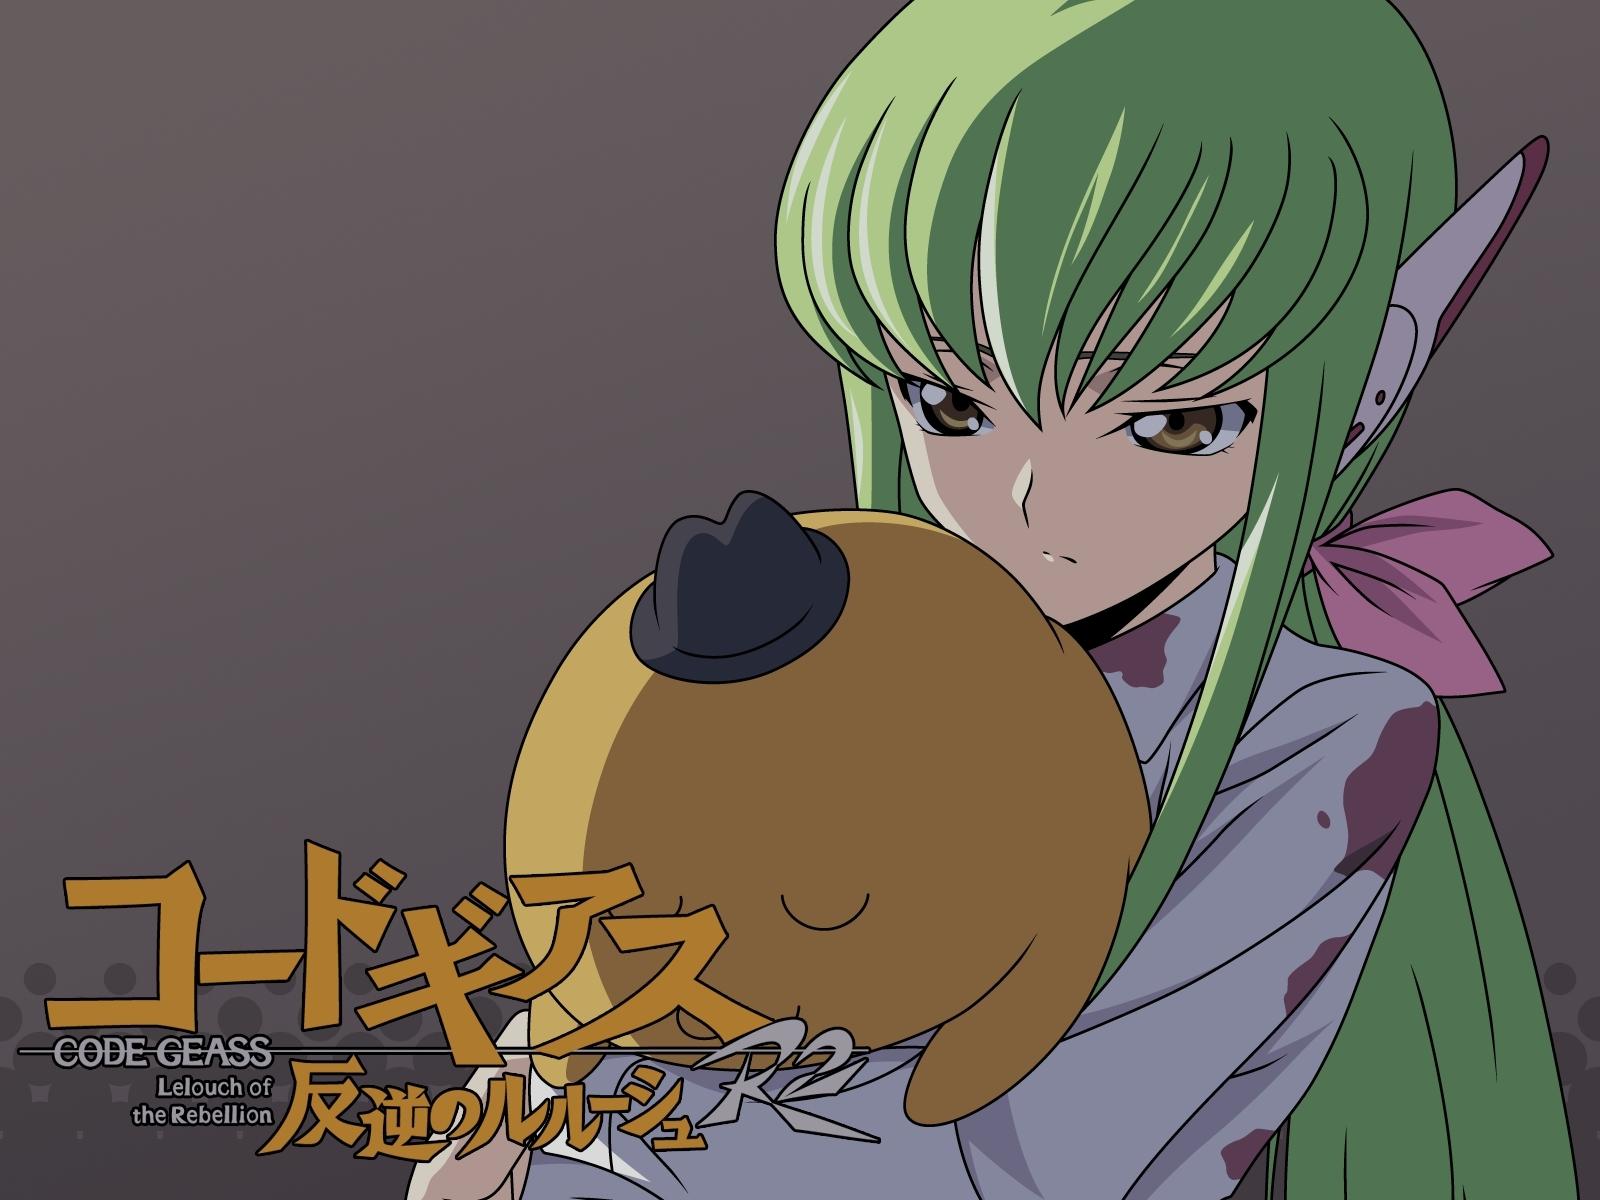 Wallpaper Ilustrasi Anime Code Geass Gambar Kartun